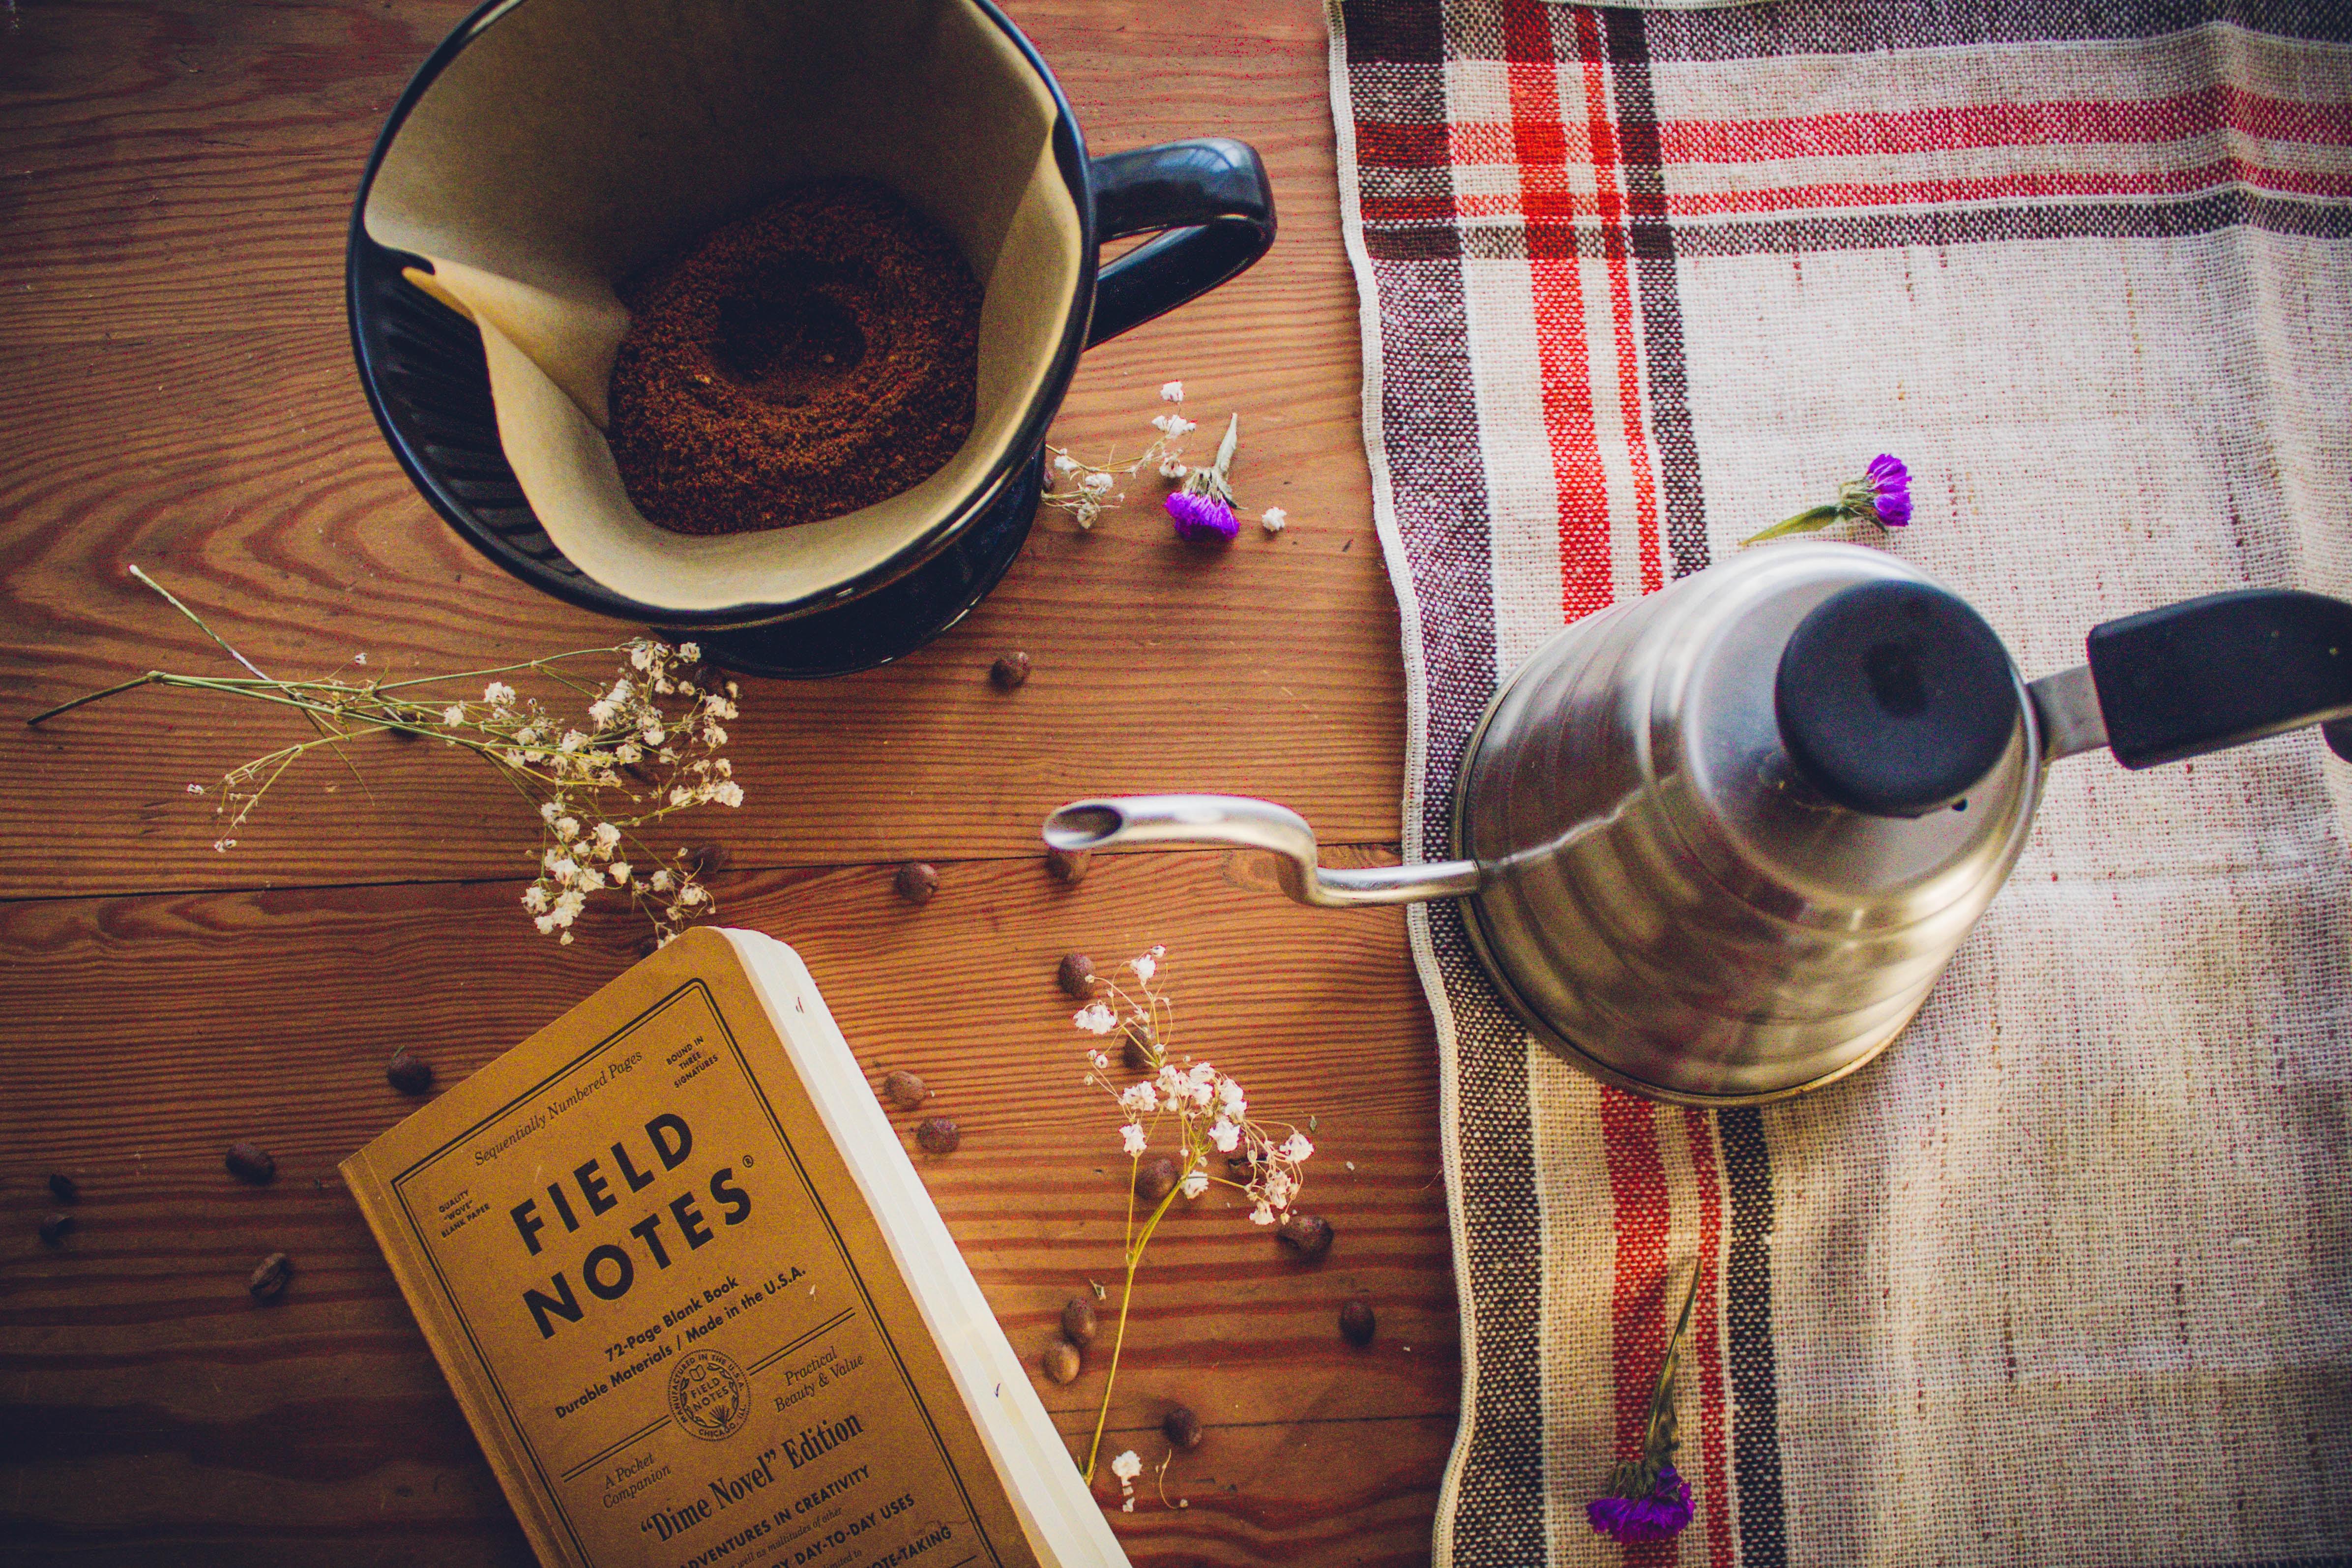 Field Notes book near coffee mug and teapot